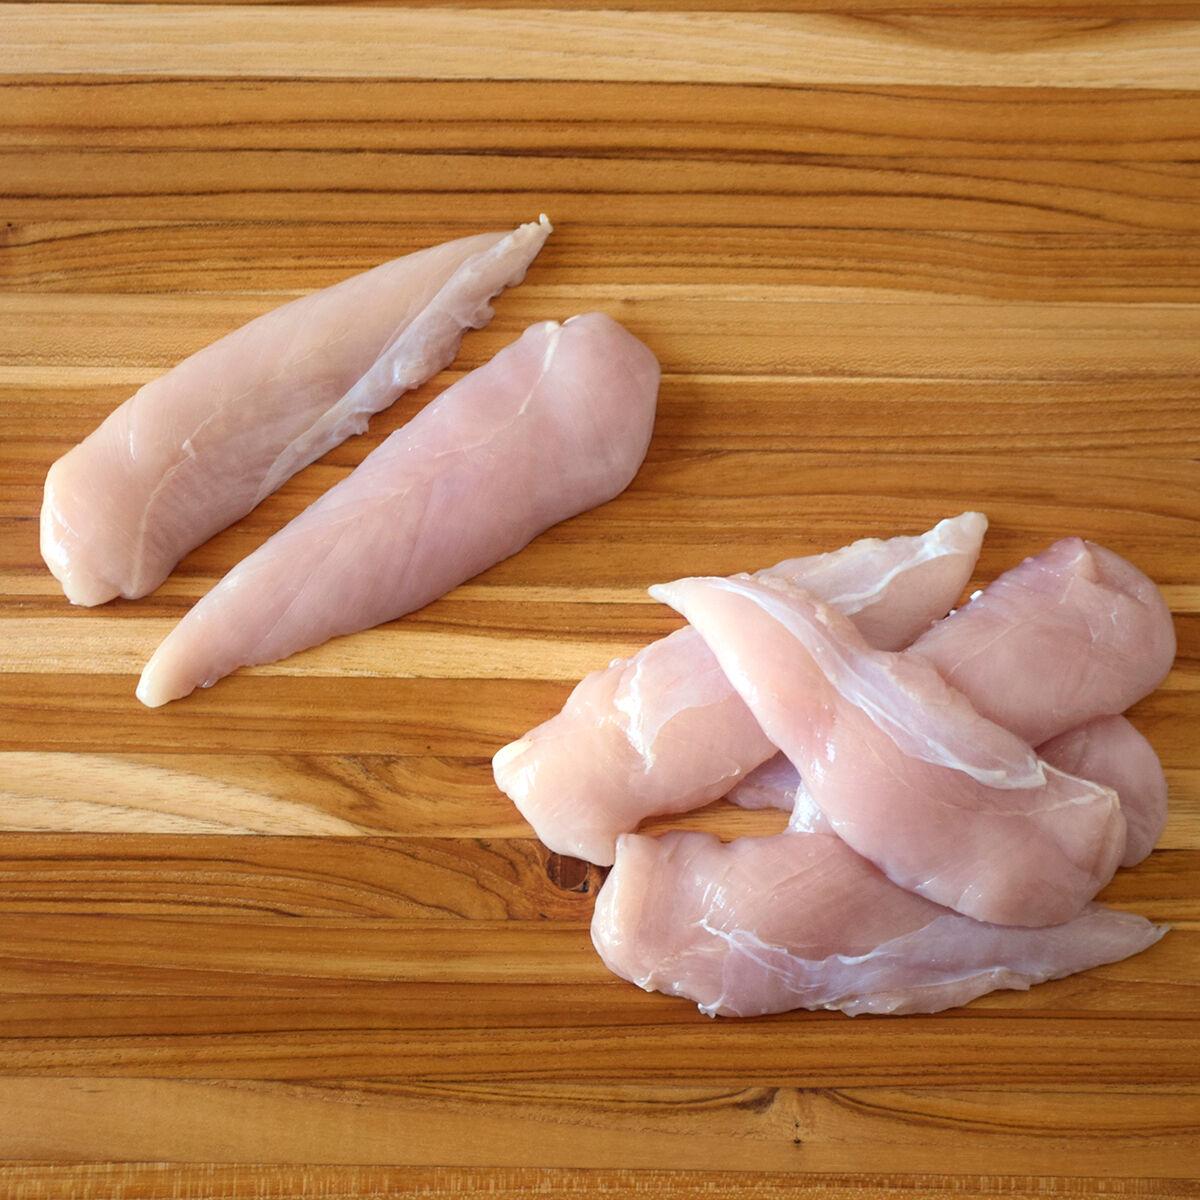 D'Artagnan Organic Chicken Tenderloins: Fresh (9lb case 9 1lb avg packs avg. each)  by D'Artagnan